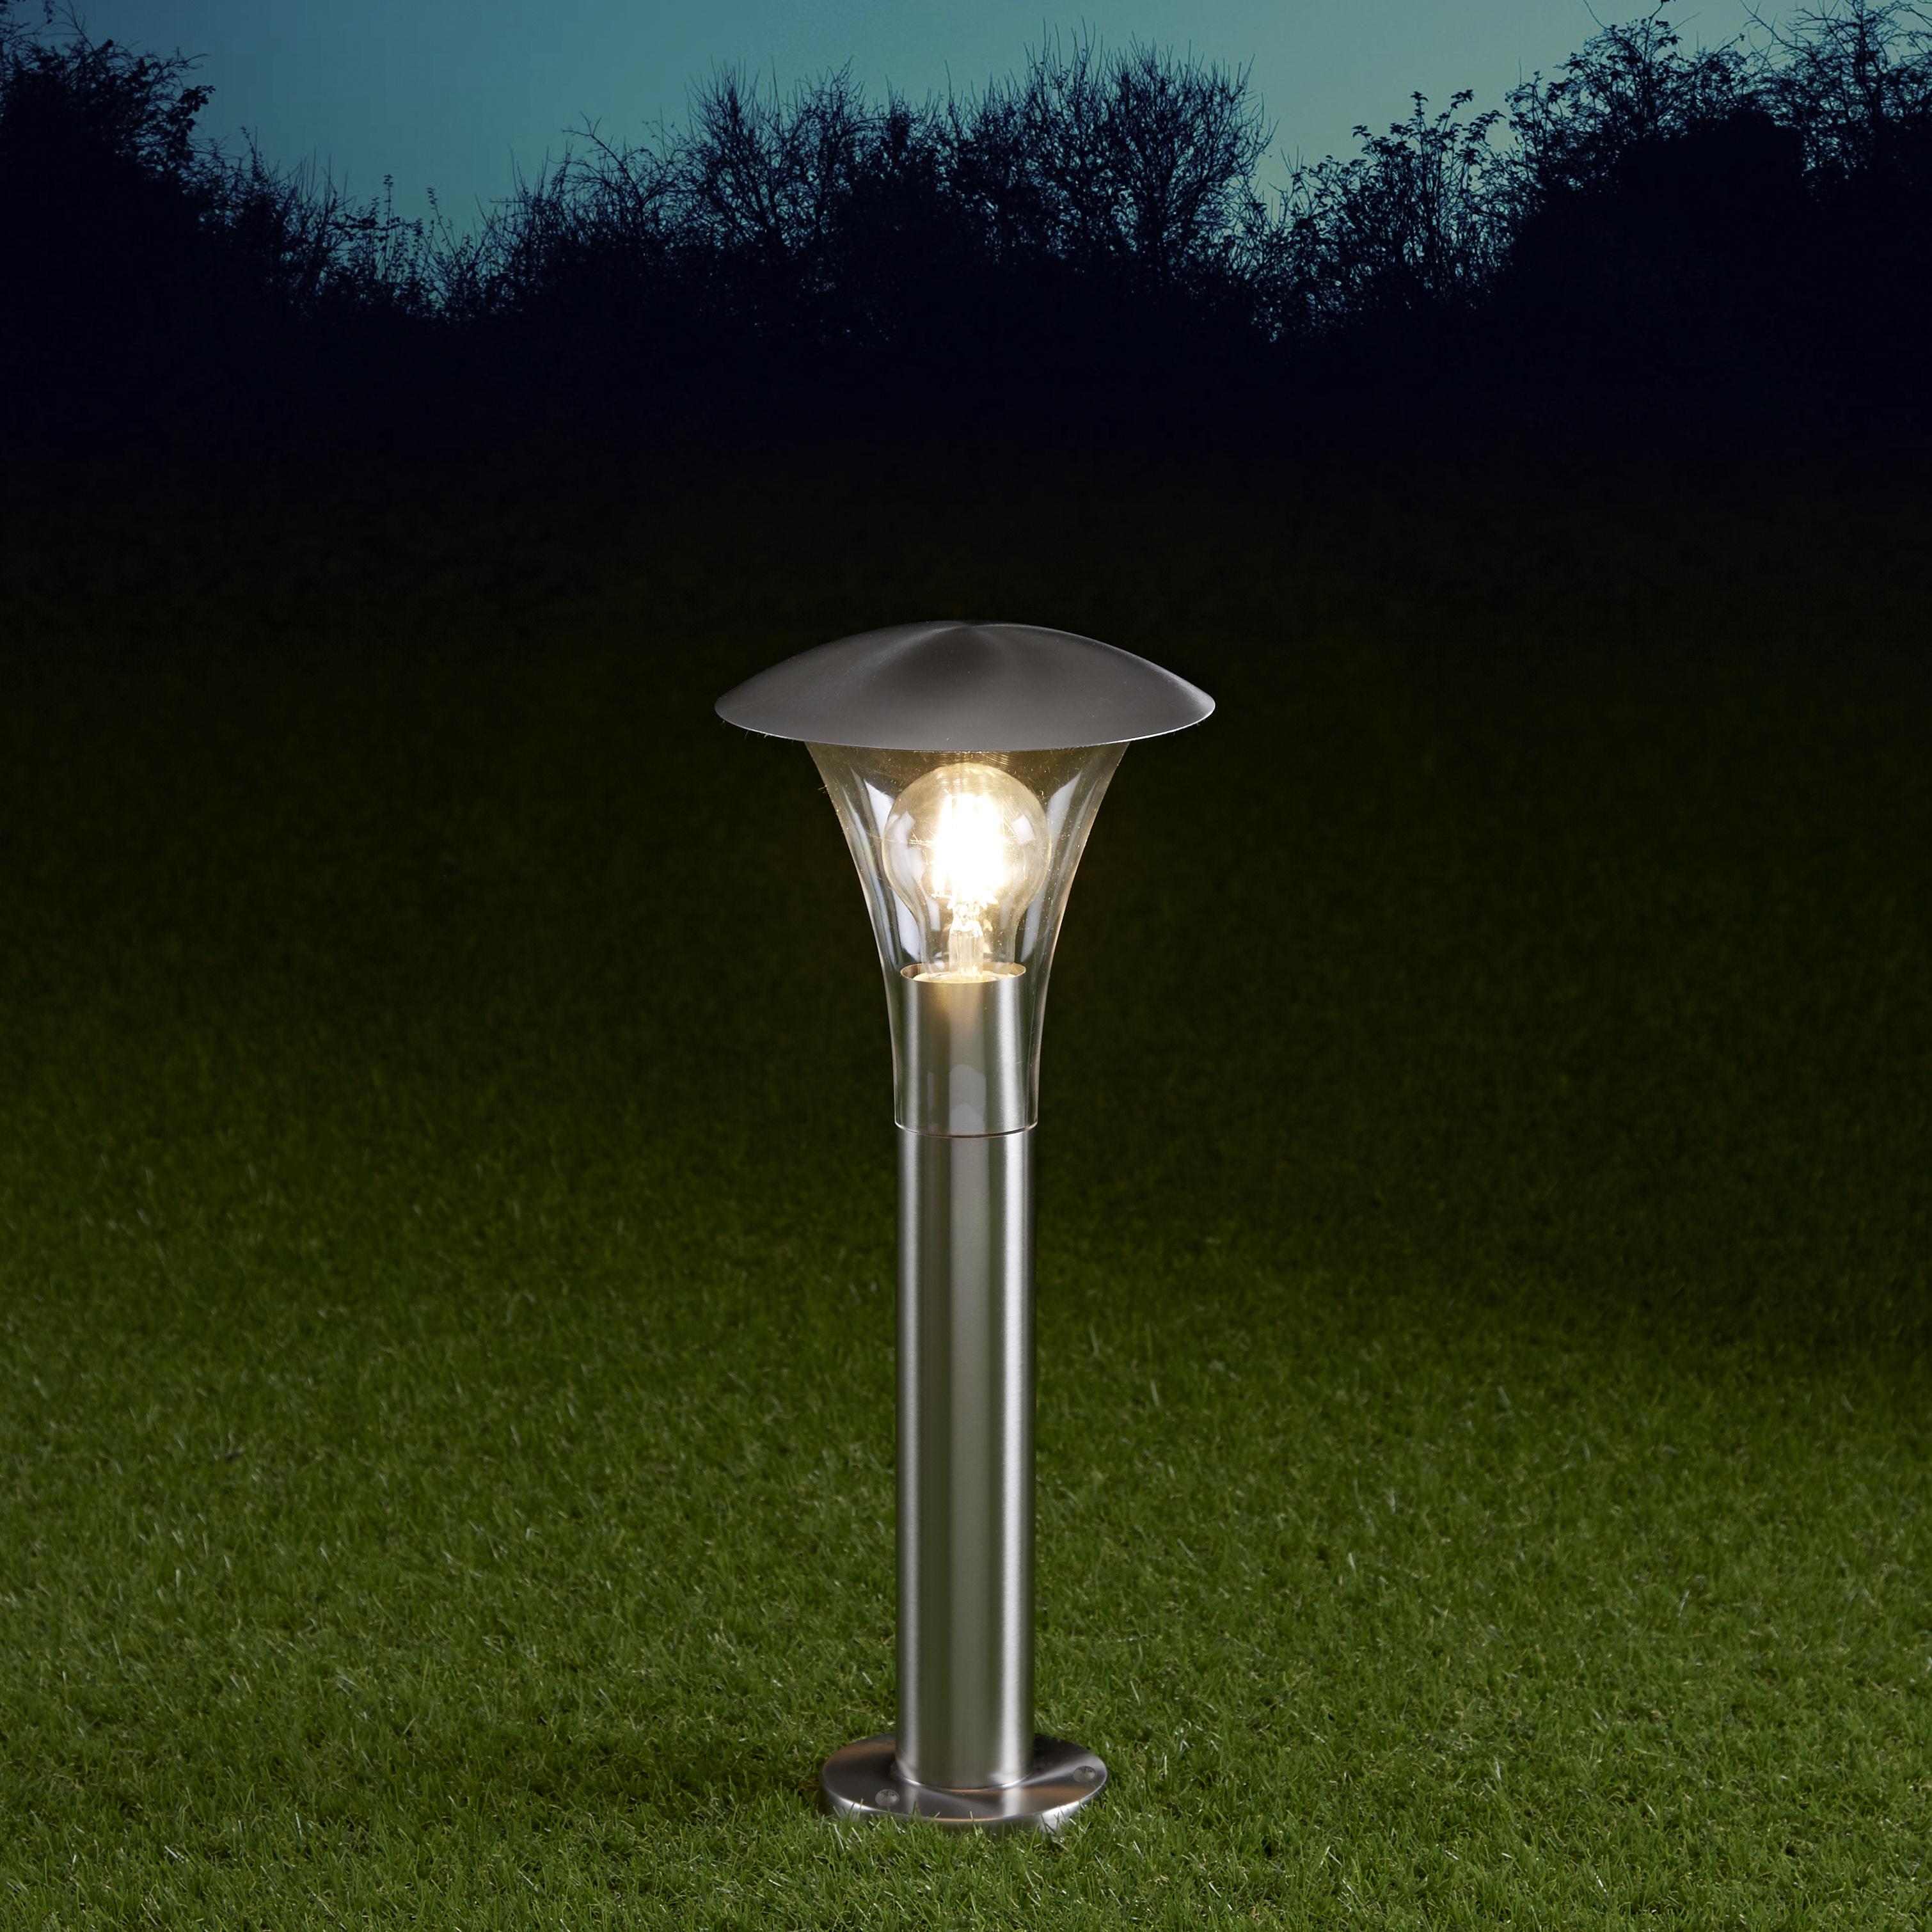 Baliza LED de 450mm para Exteriores de Acero Inoxidable - Cholet